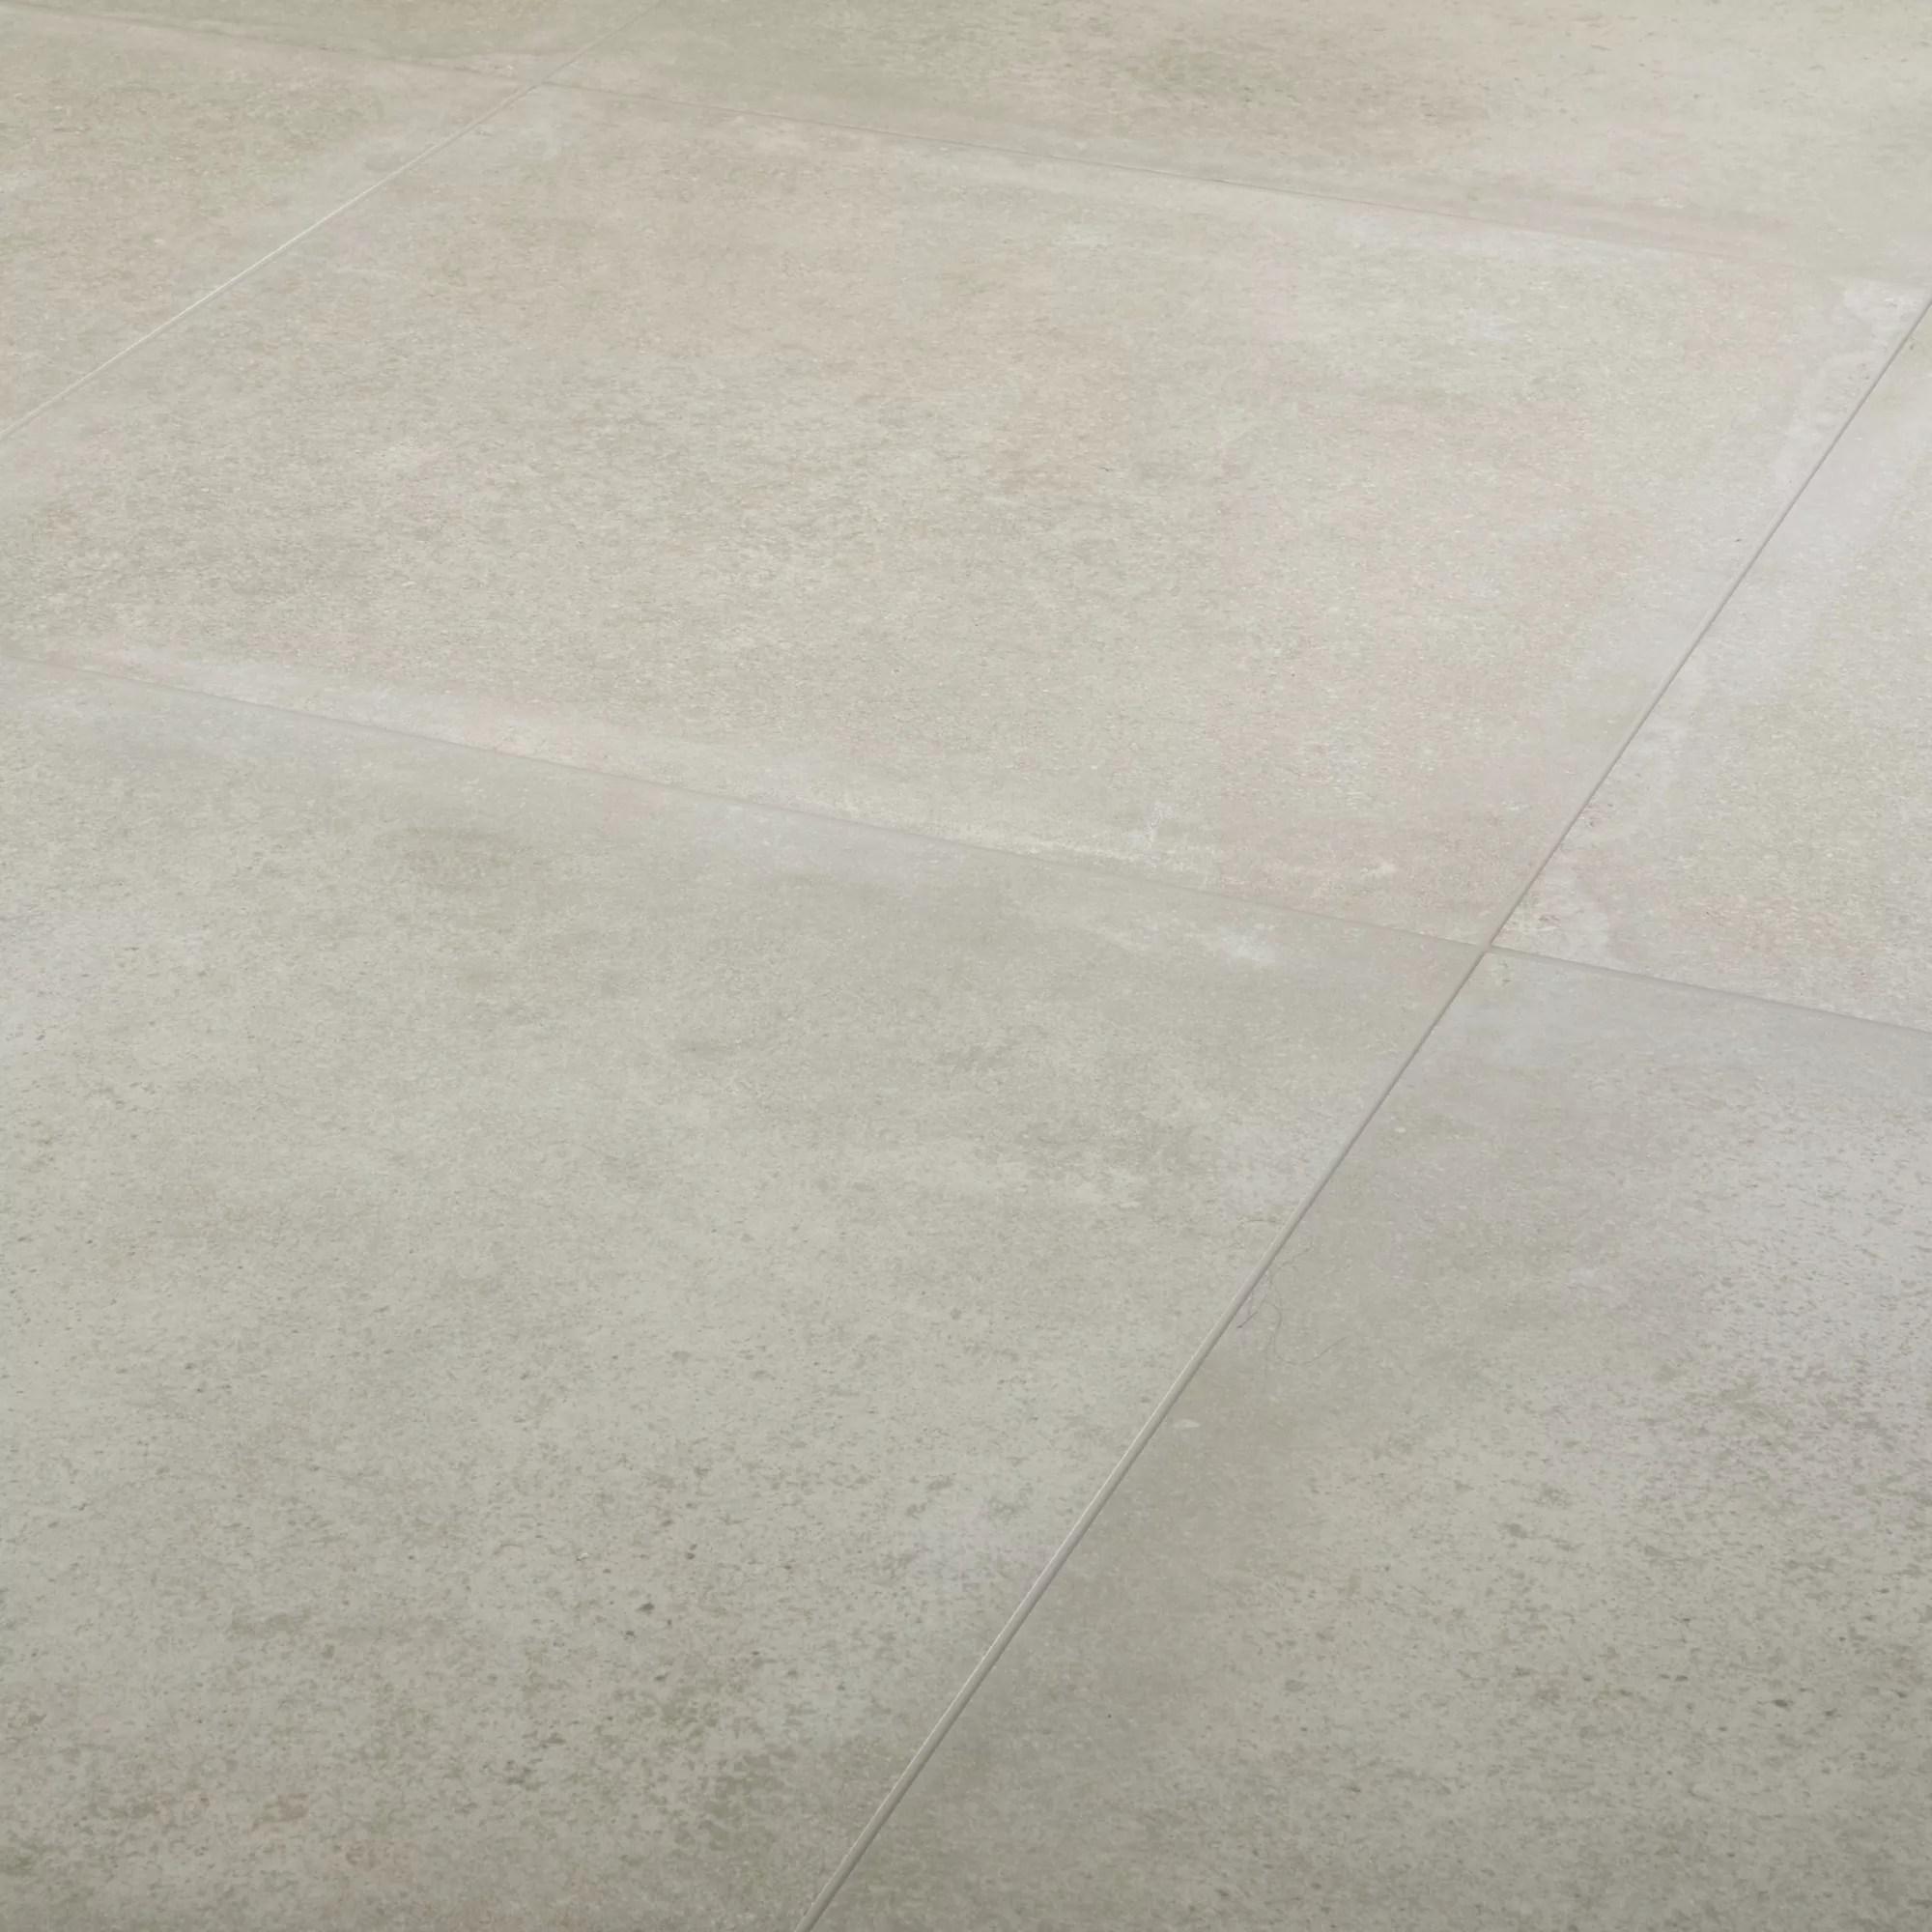 kontainer greige matt concrete effect porcelain floor tile pack of 3 l 590mm w 590mm